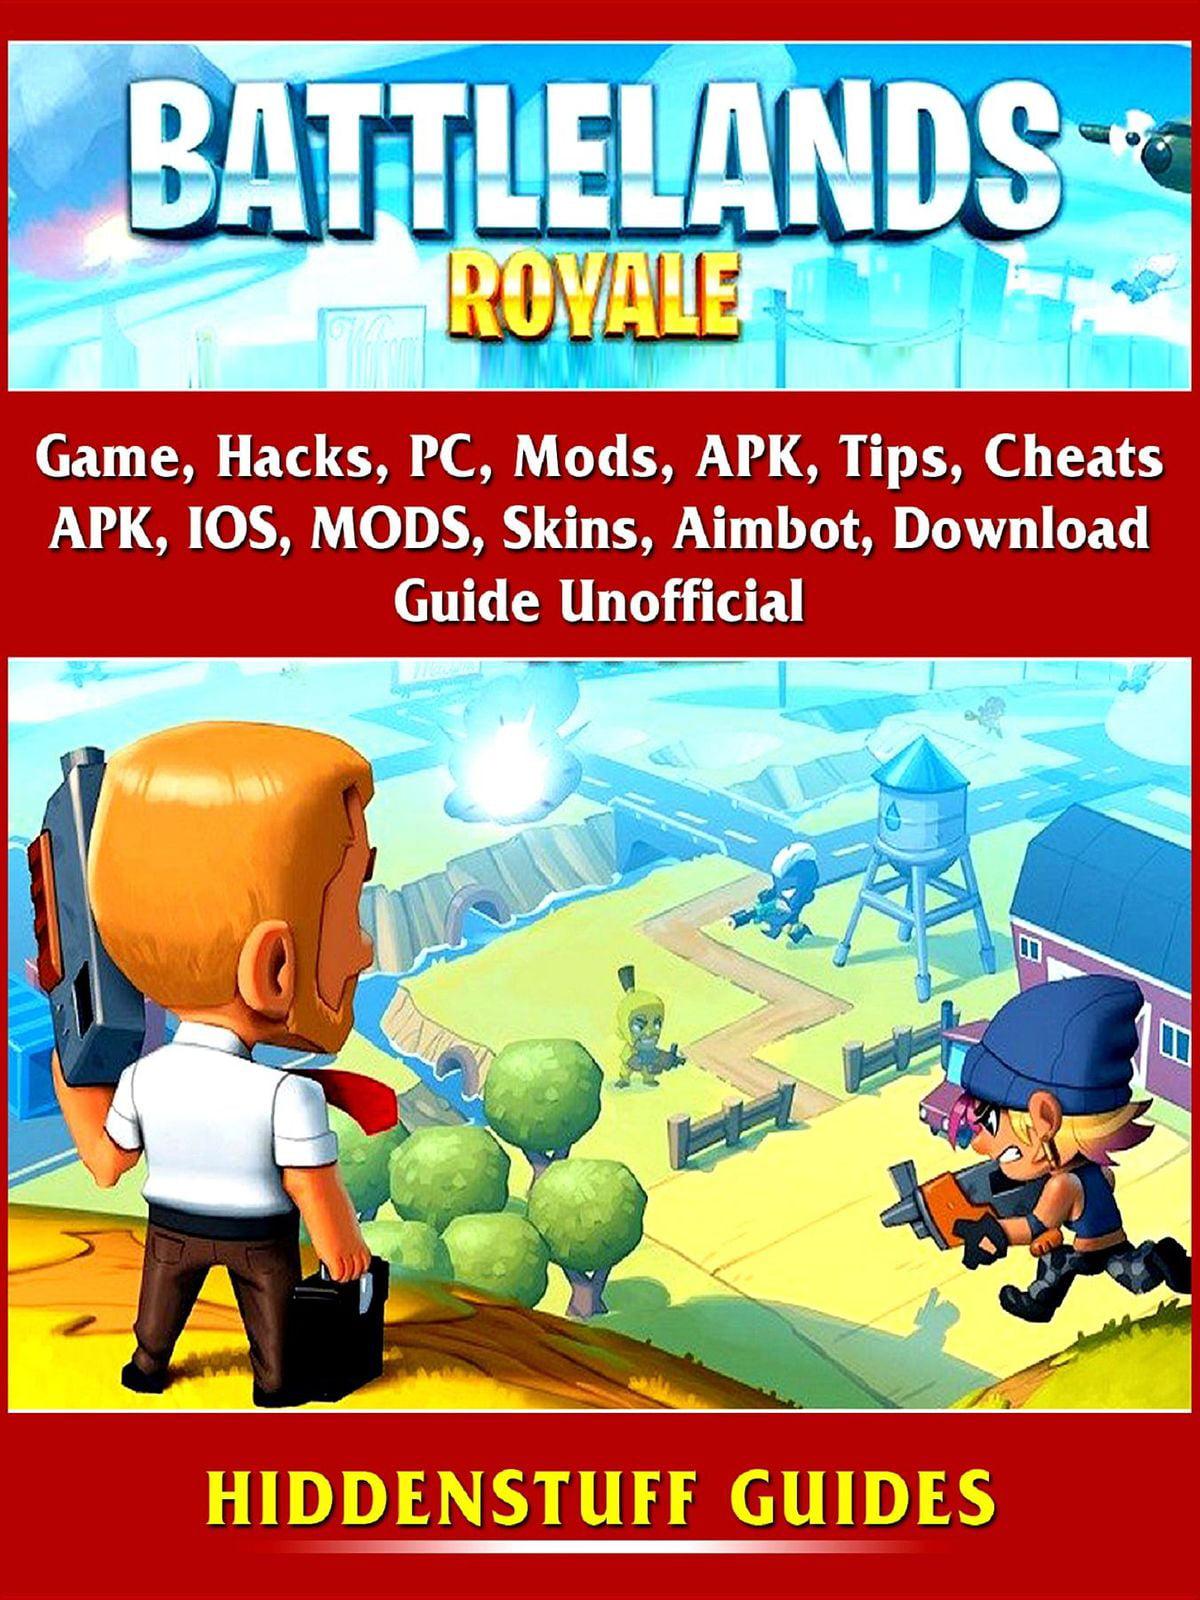 Battlelands Royale Game, Hacks, PC, Mods, APK, Tips, Cheats, APK, IOS,  MODS, Skins, Aimbot, Download, Guide Unofficial - eBook